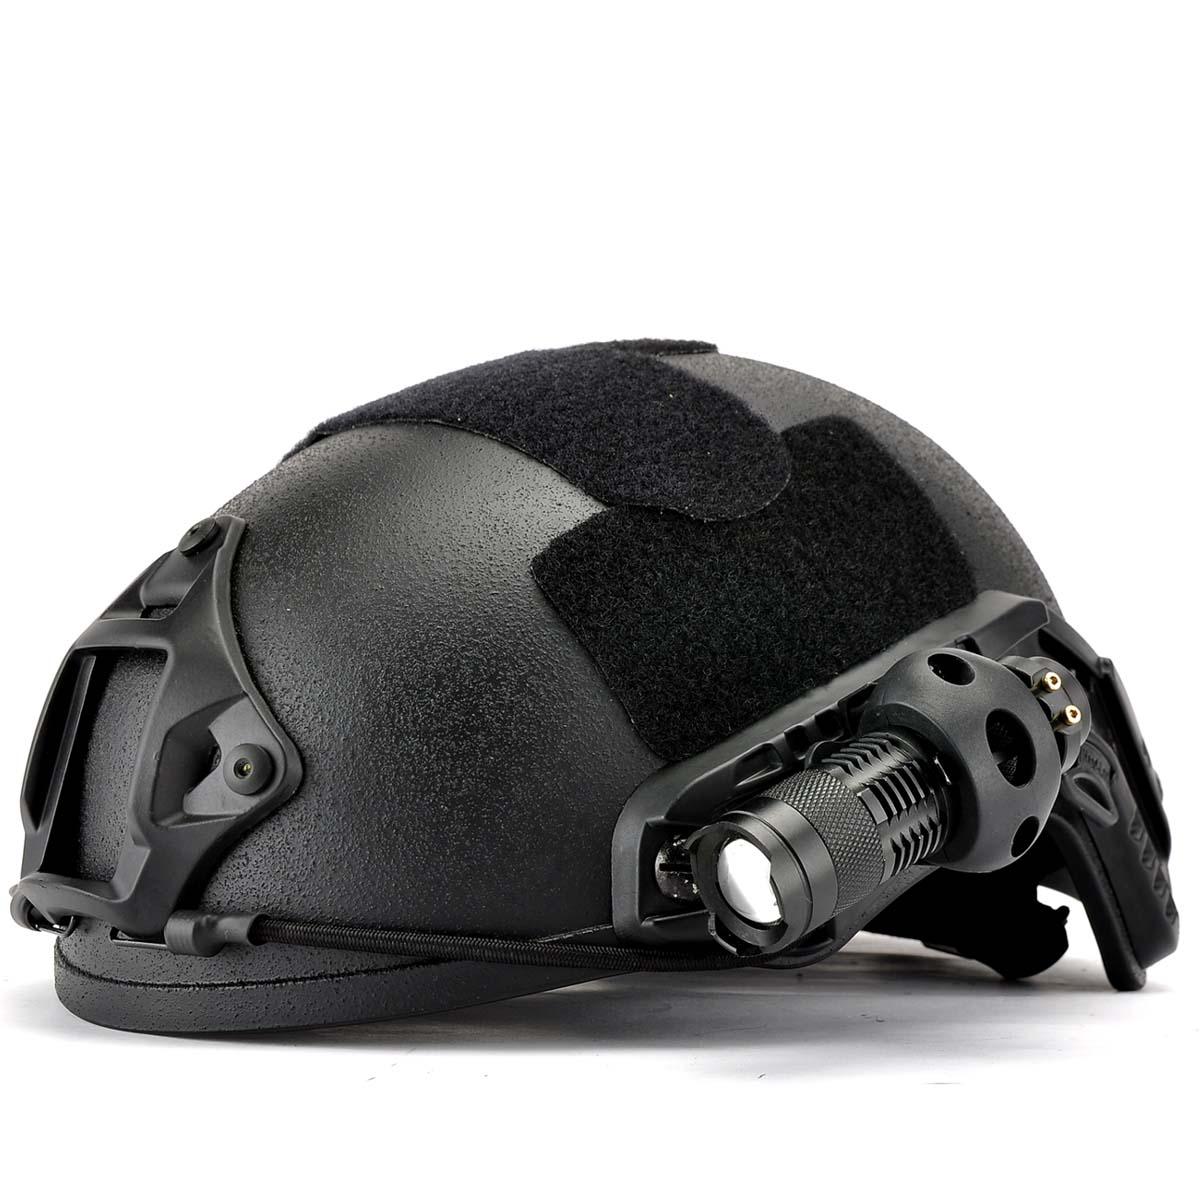 Каски и шлемы для туризма Jedi fight back OPS Jedi fight back